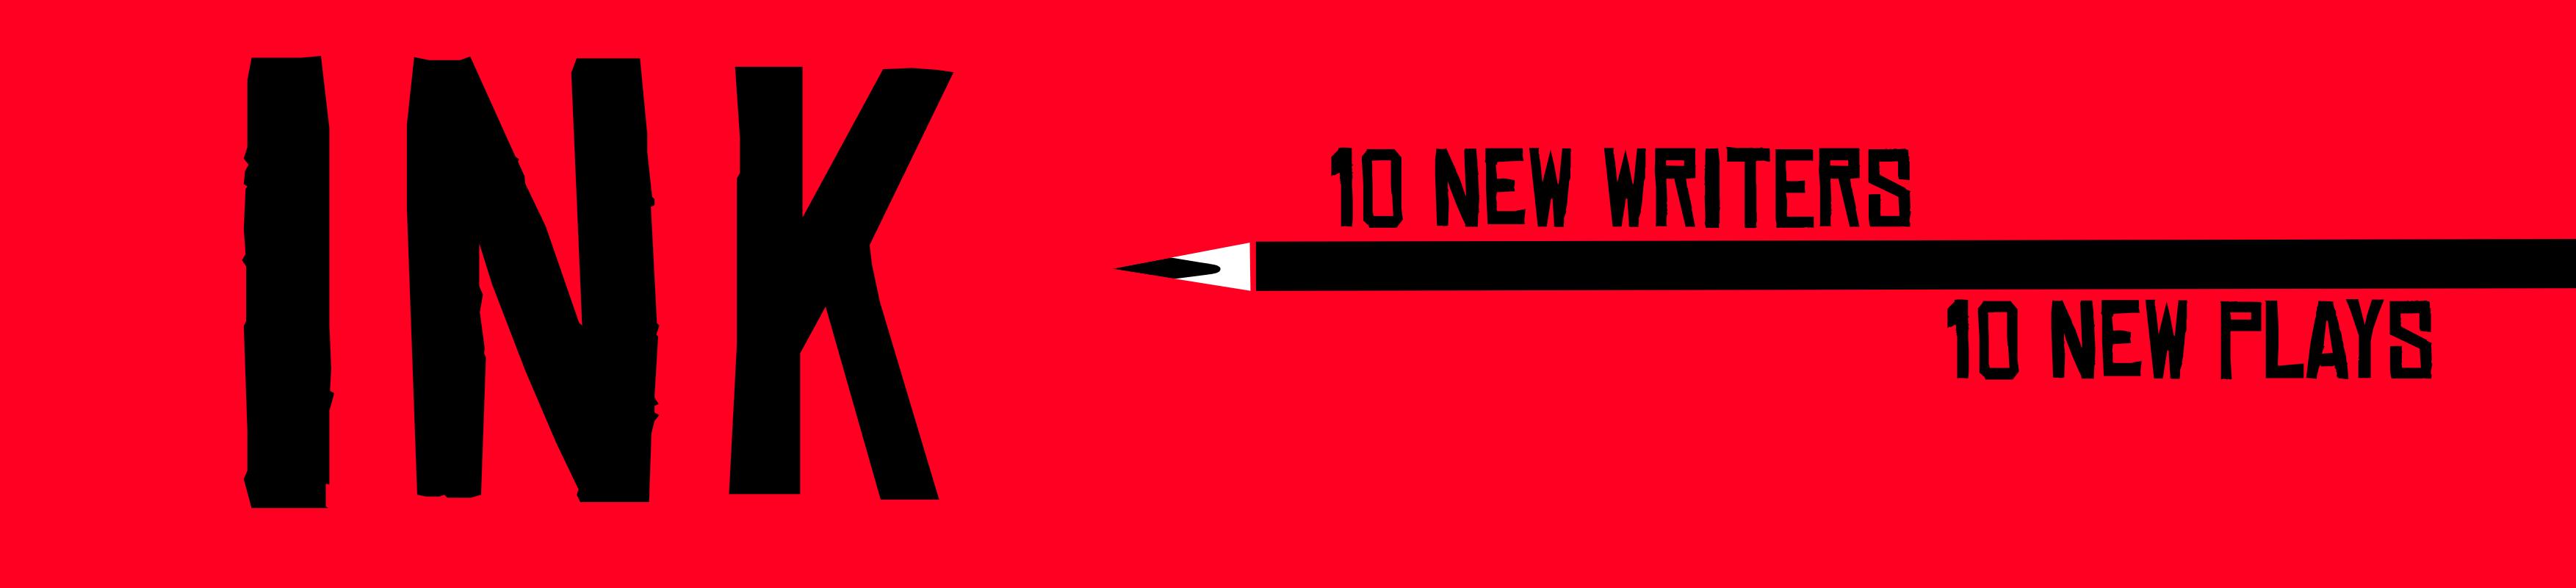 Ink Page Header